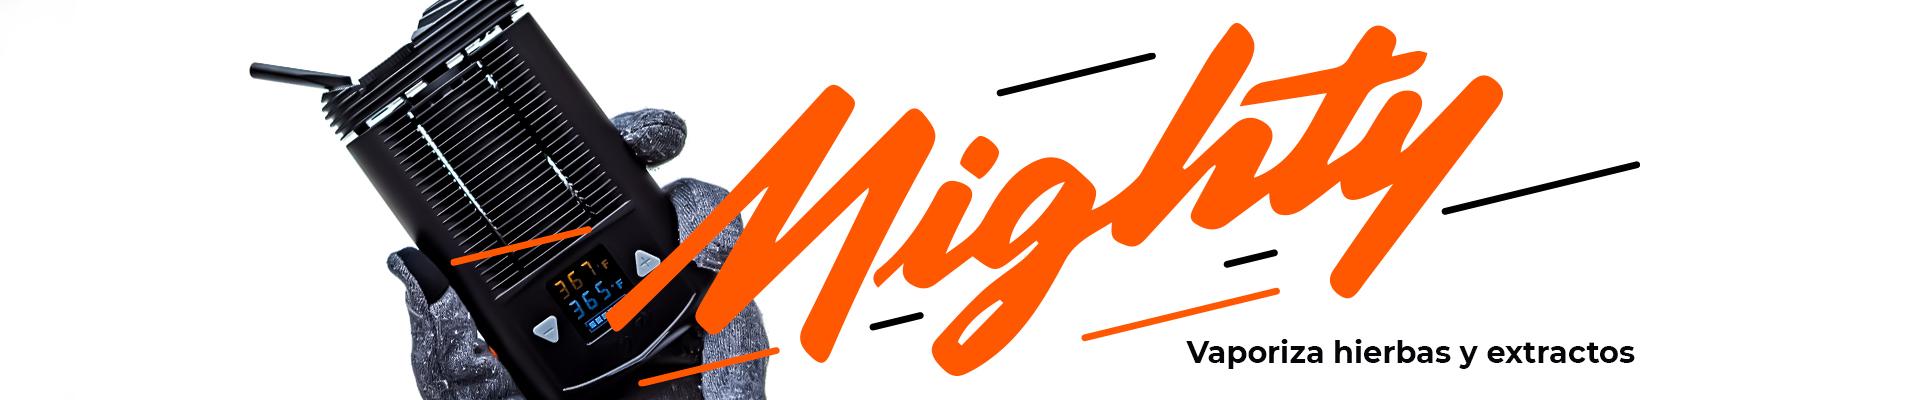 storz-and-bickel-mighty-vaporizador-banner